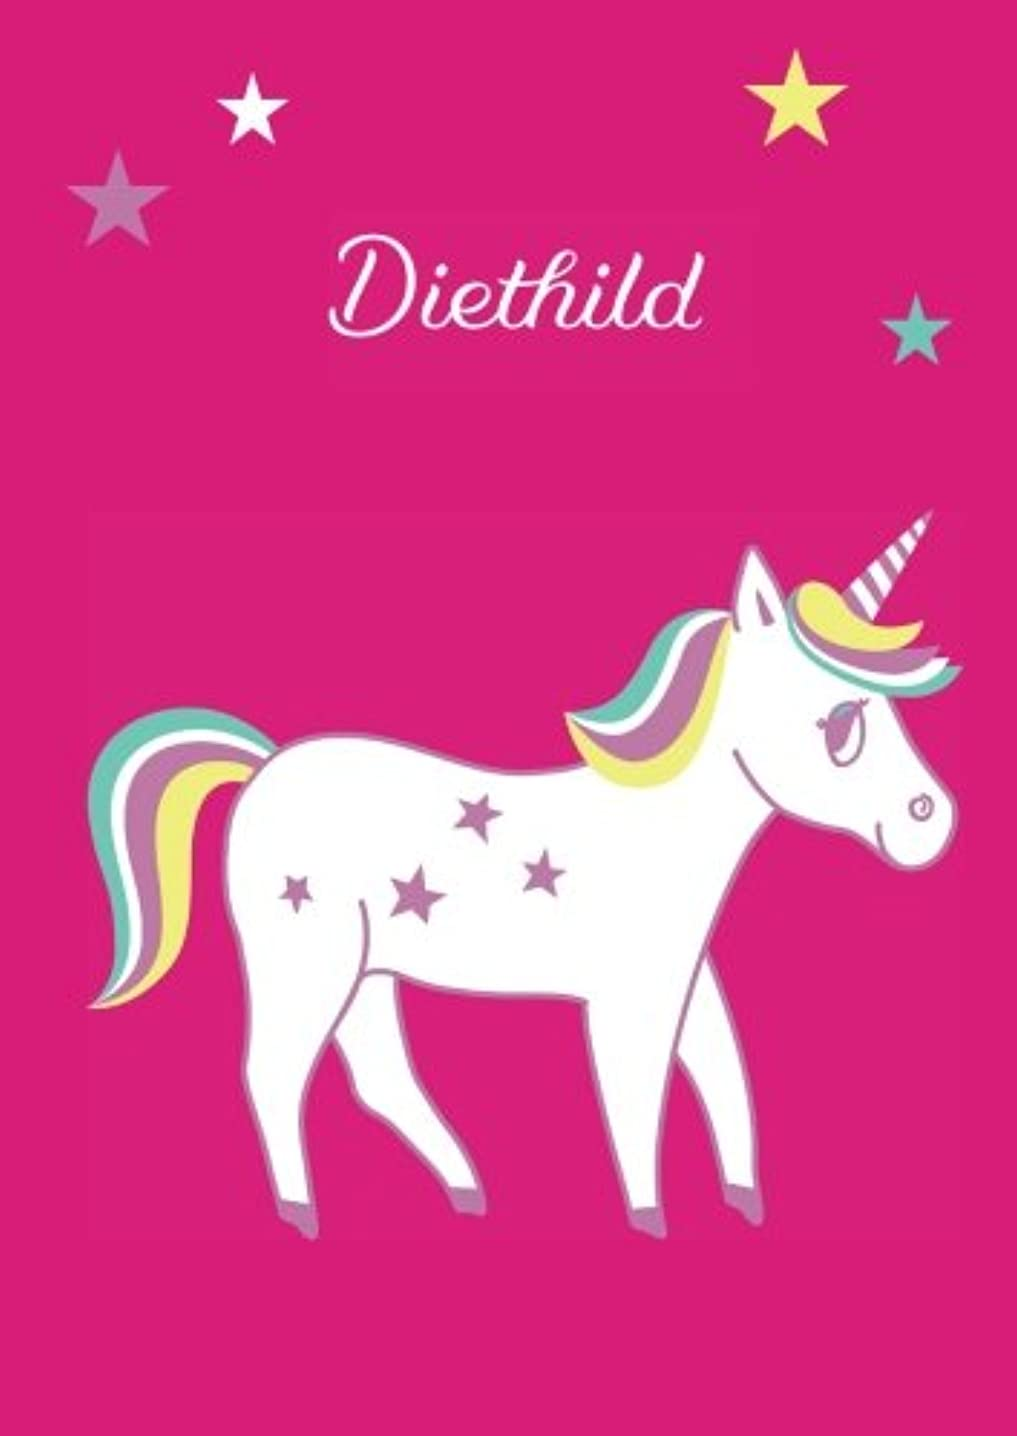 ルネッサンス聖域資本主義Diethild: Einhorn Malbuch / Tagebuch / Notizbuch - DIN A4 - blanko